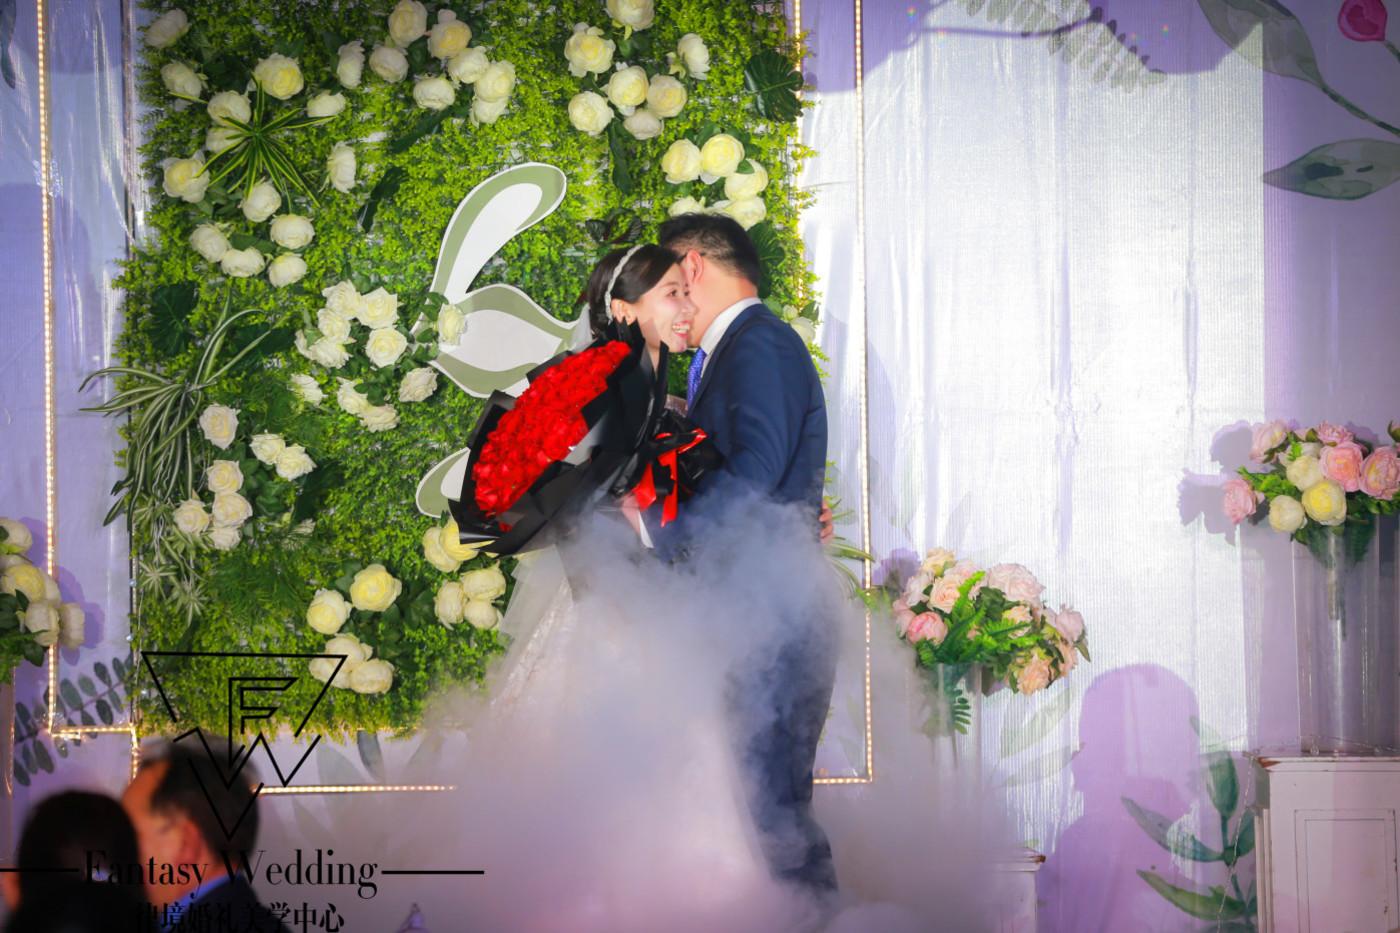 「Fantasy Wedding」& A/P 南艳湖24